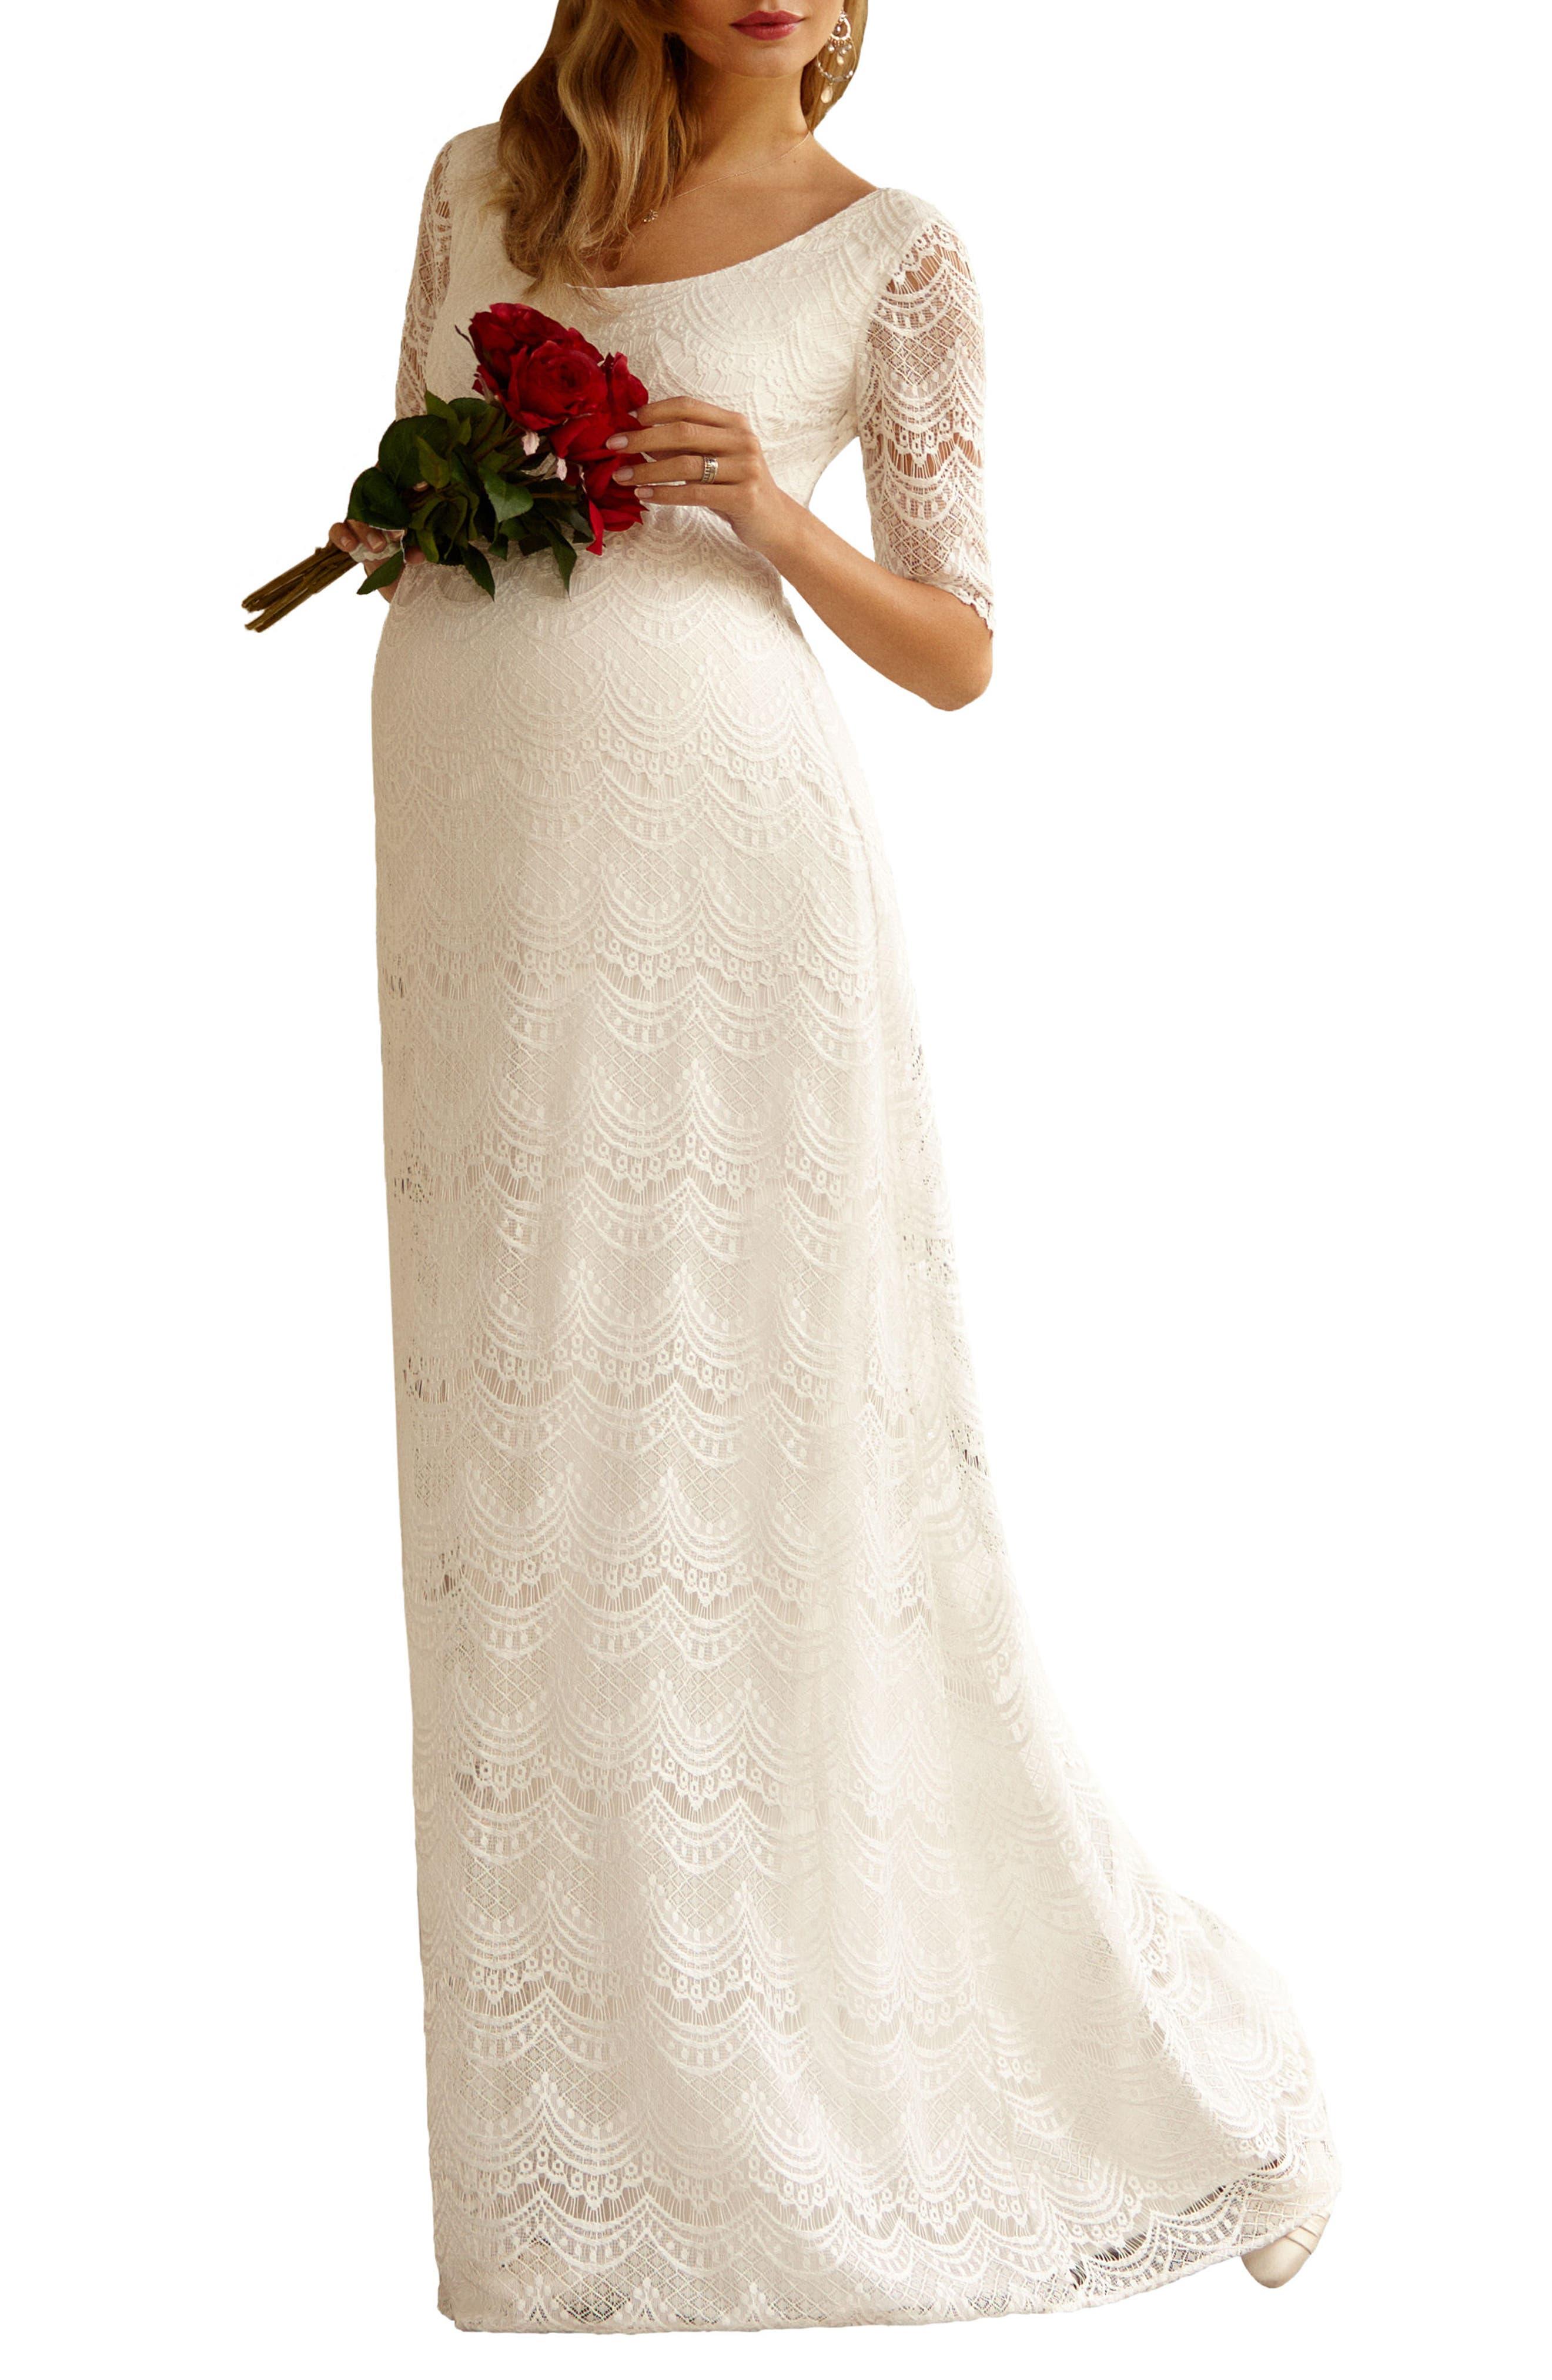 Verona Maternity Gown,                             Main thumbnail 1, color,                             BRIGHT IVORY